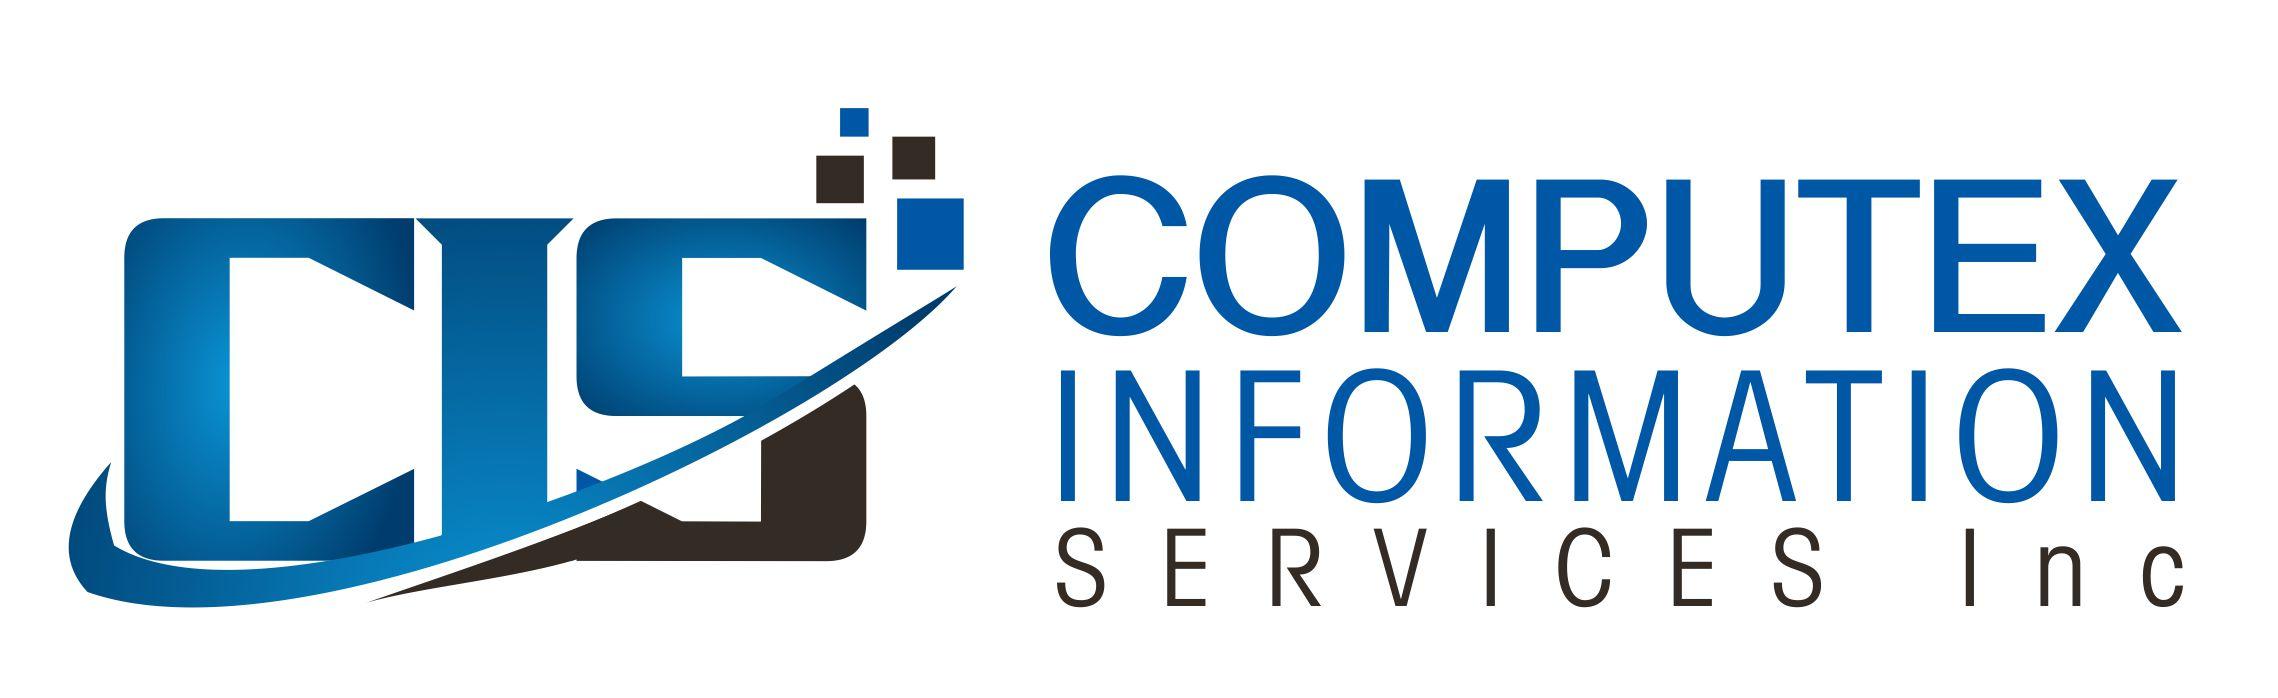 Computex Information Services, Inc.